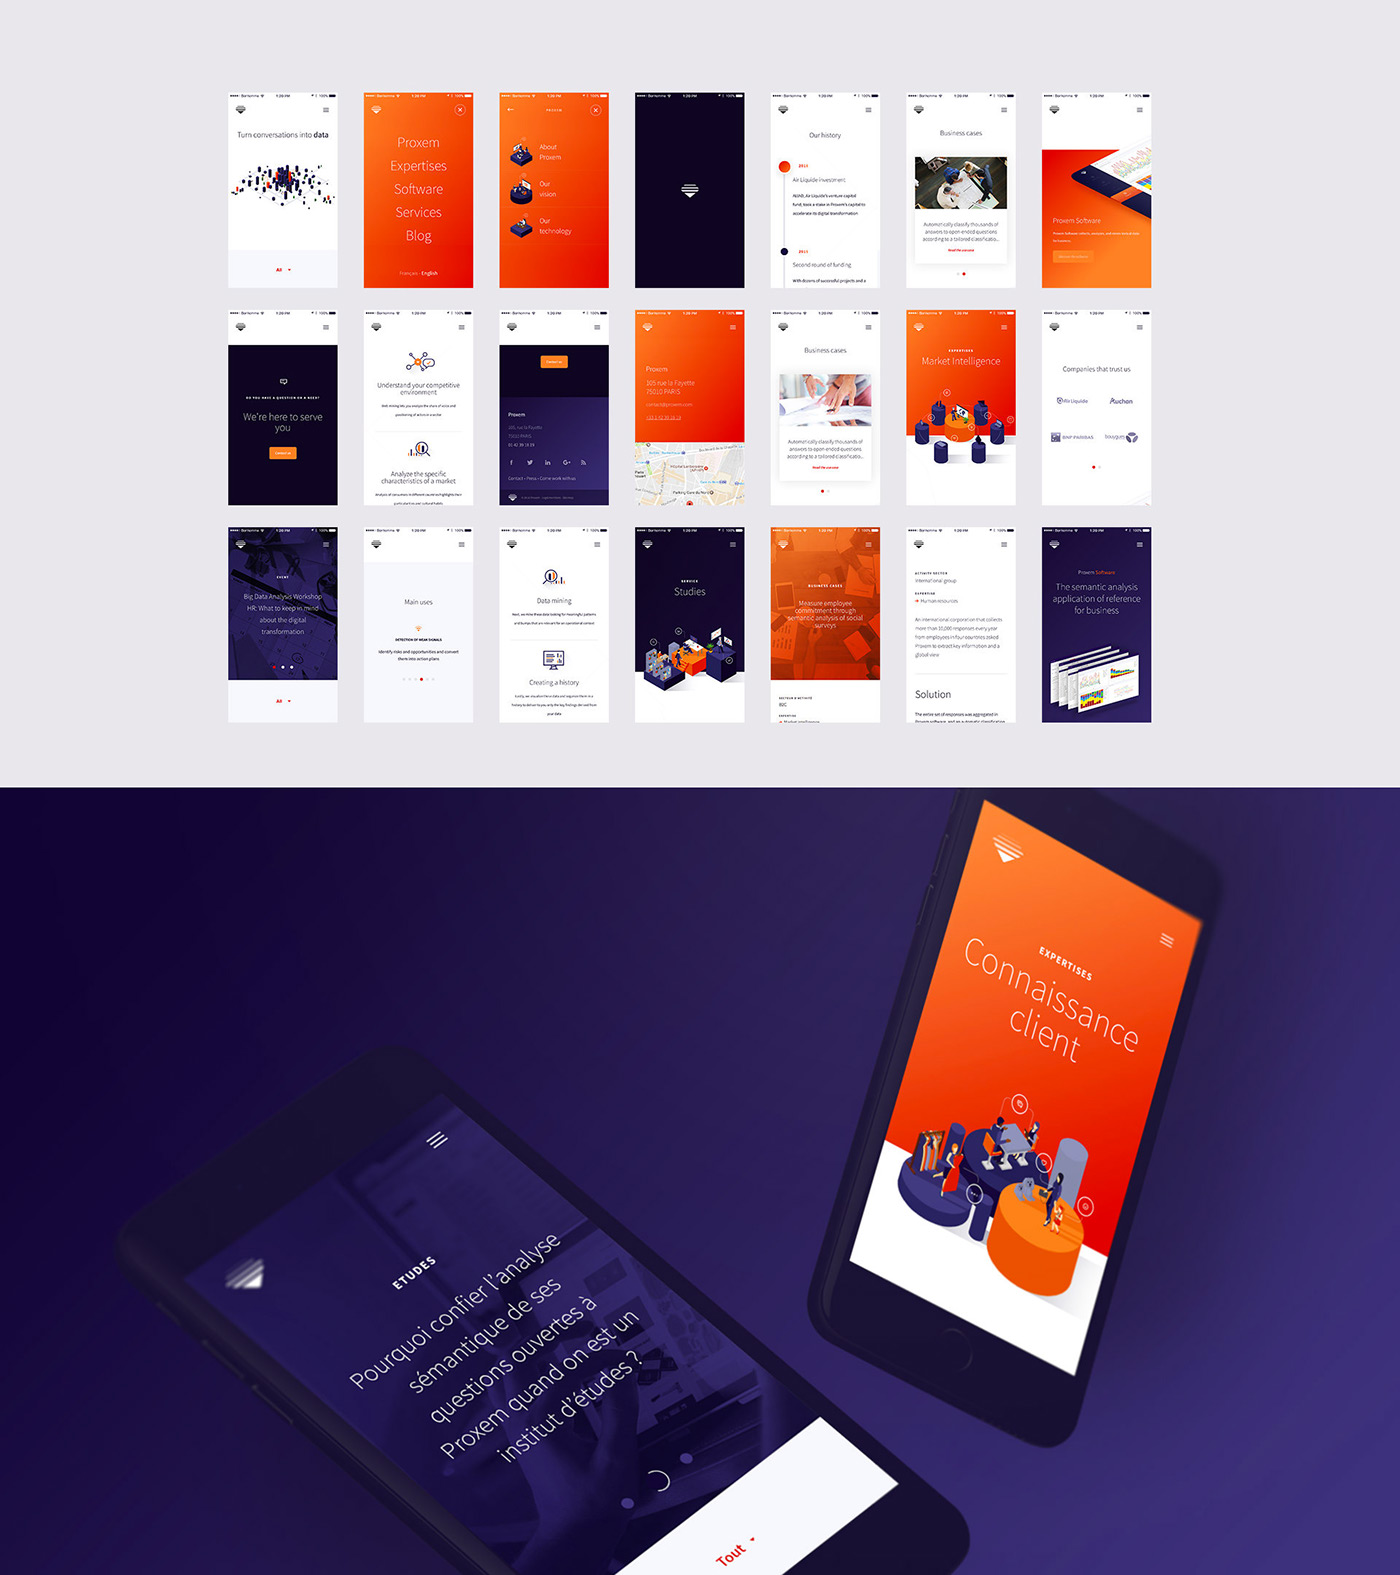 design UI / UX art direction  icons illustrations identity corporate branding  Logotype